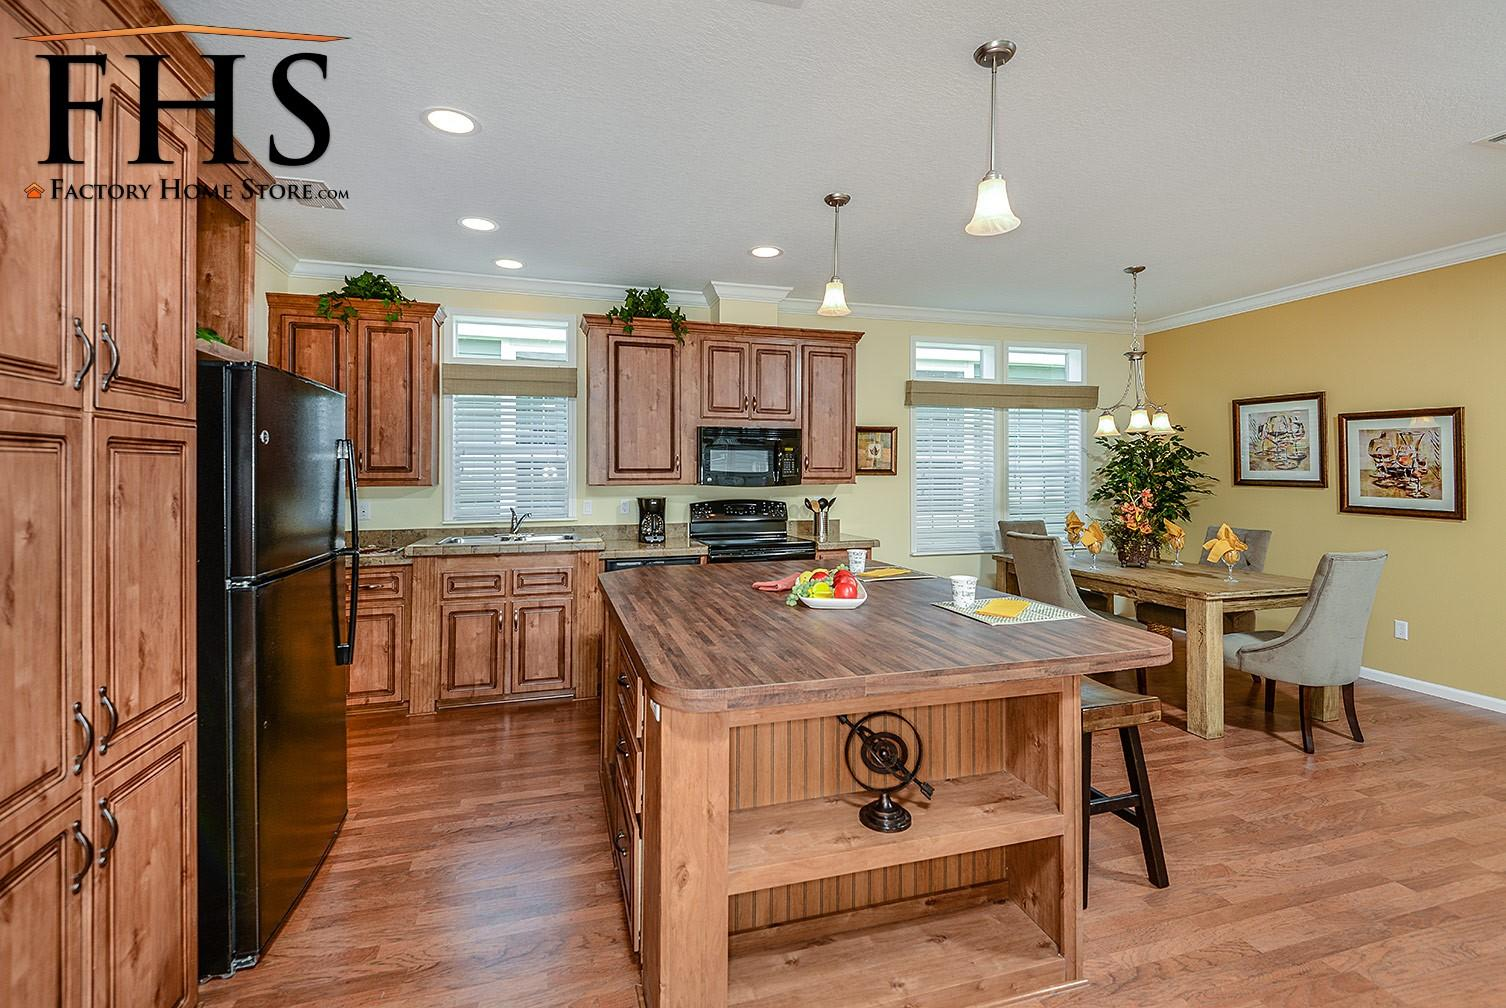 Citrus Homes / Meadowood Homes of Florida South image 3